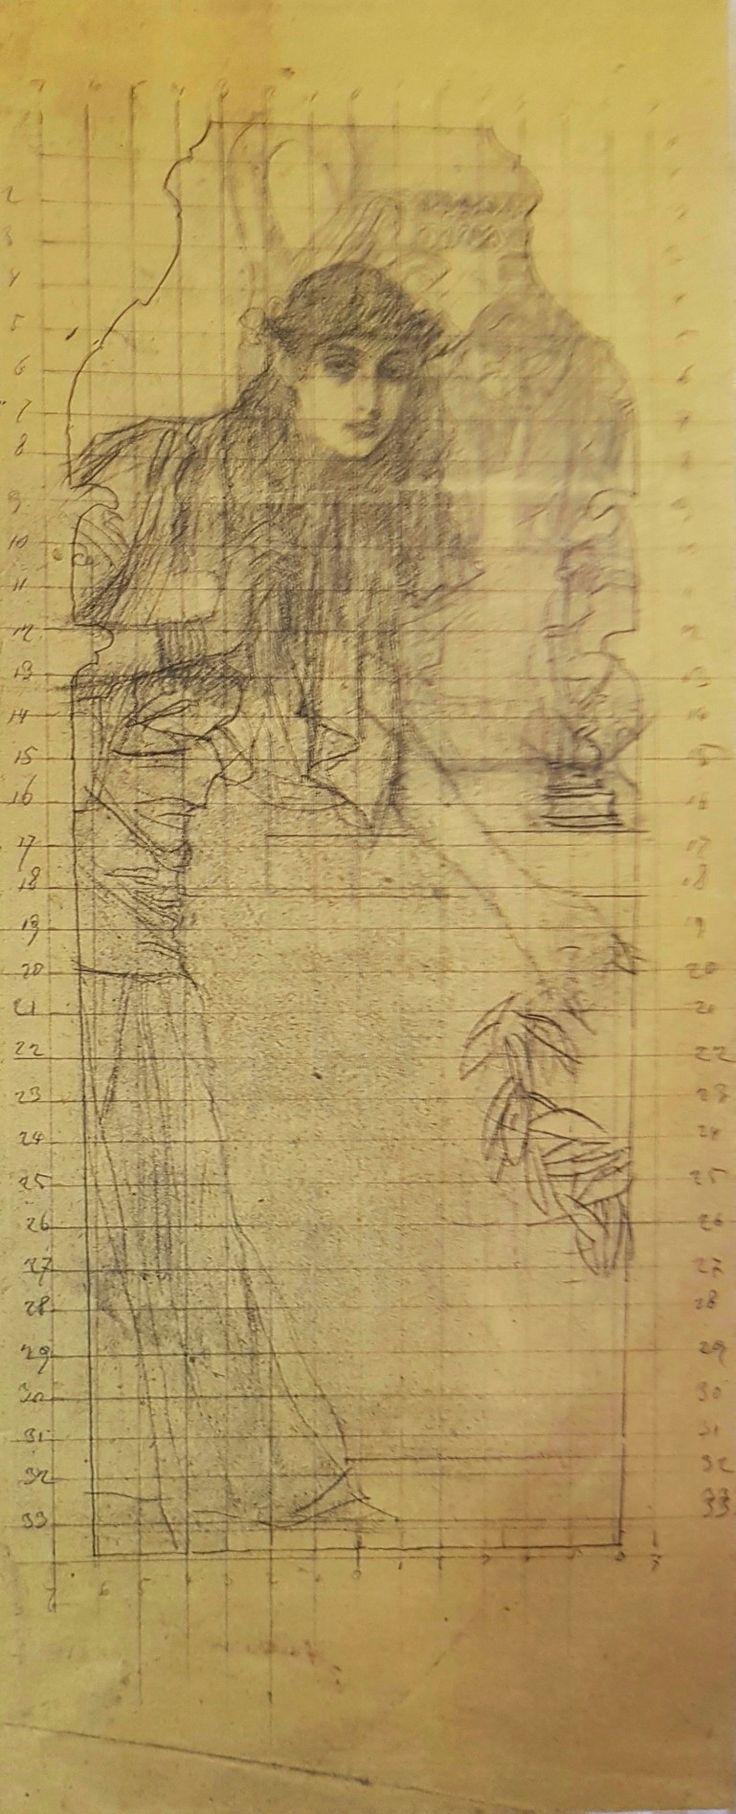 "Gustav Klimt: Studio per l'intercolumnio ""Antichità greca II"" (1890-91) gessetto nero, matita e penna 45x63,4"